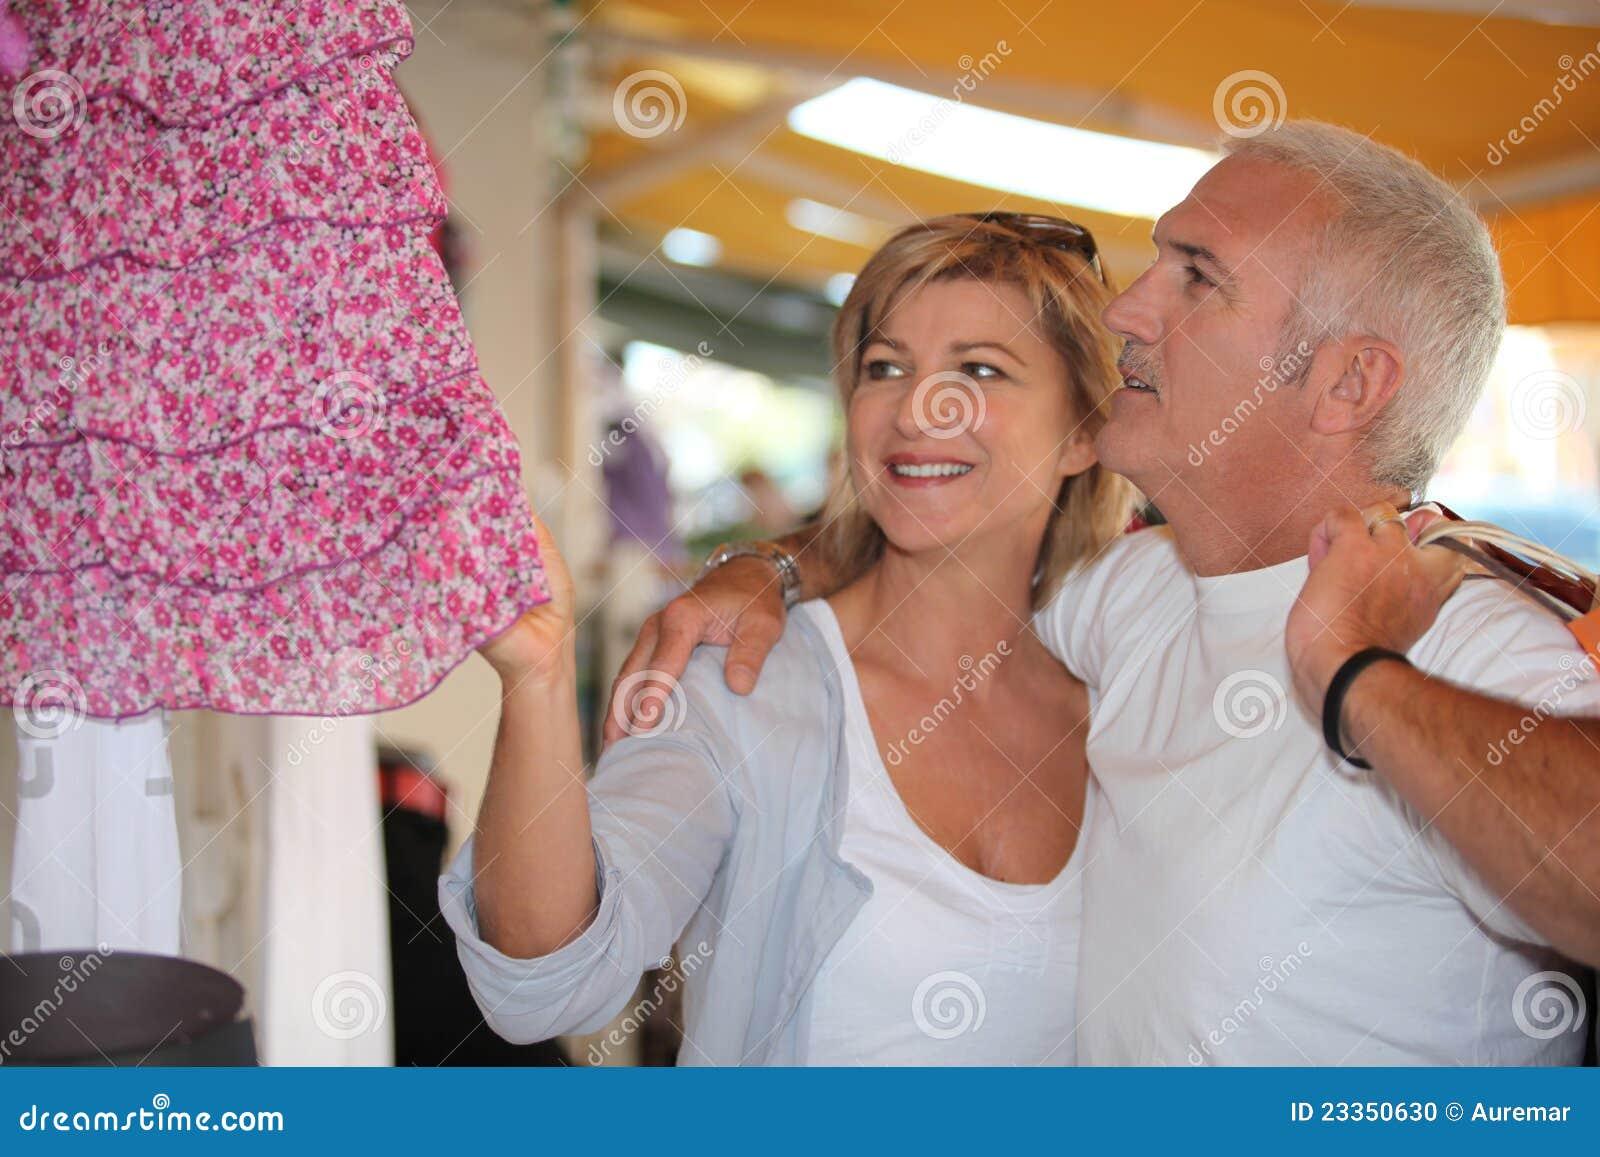 mature-couple-clothing-store-23350630.jpg